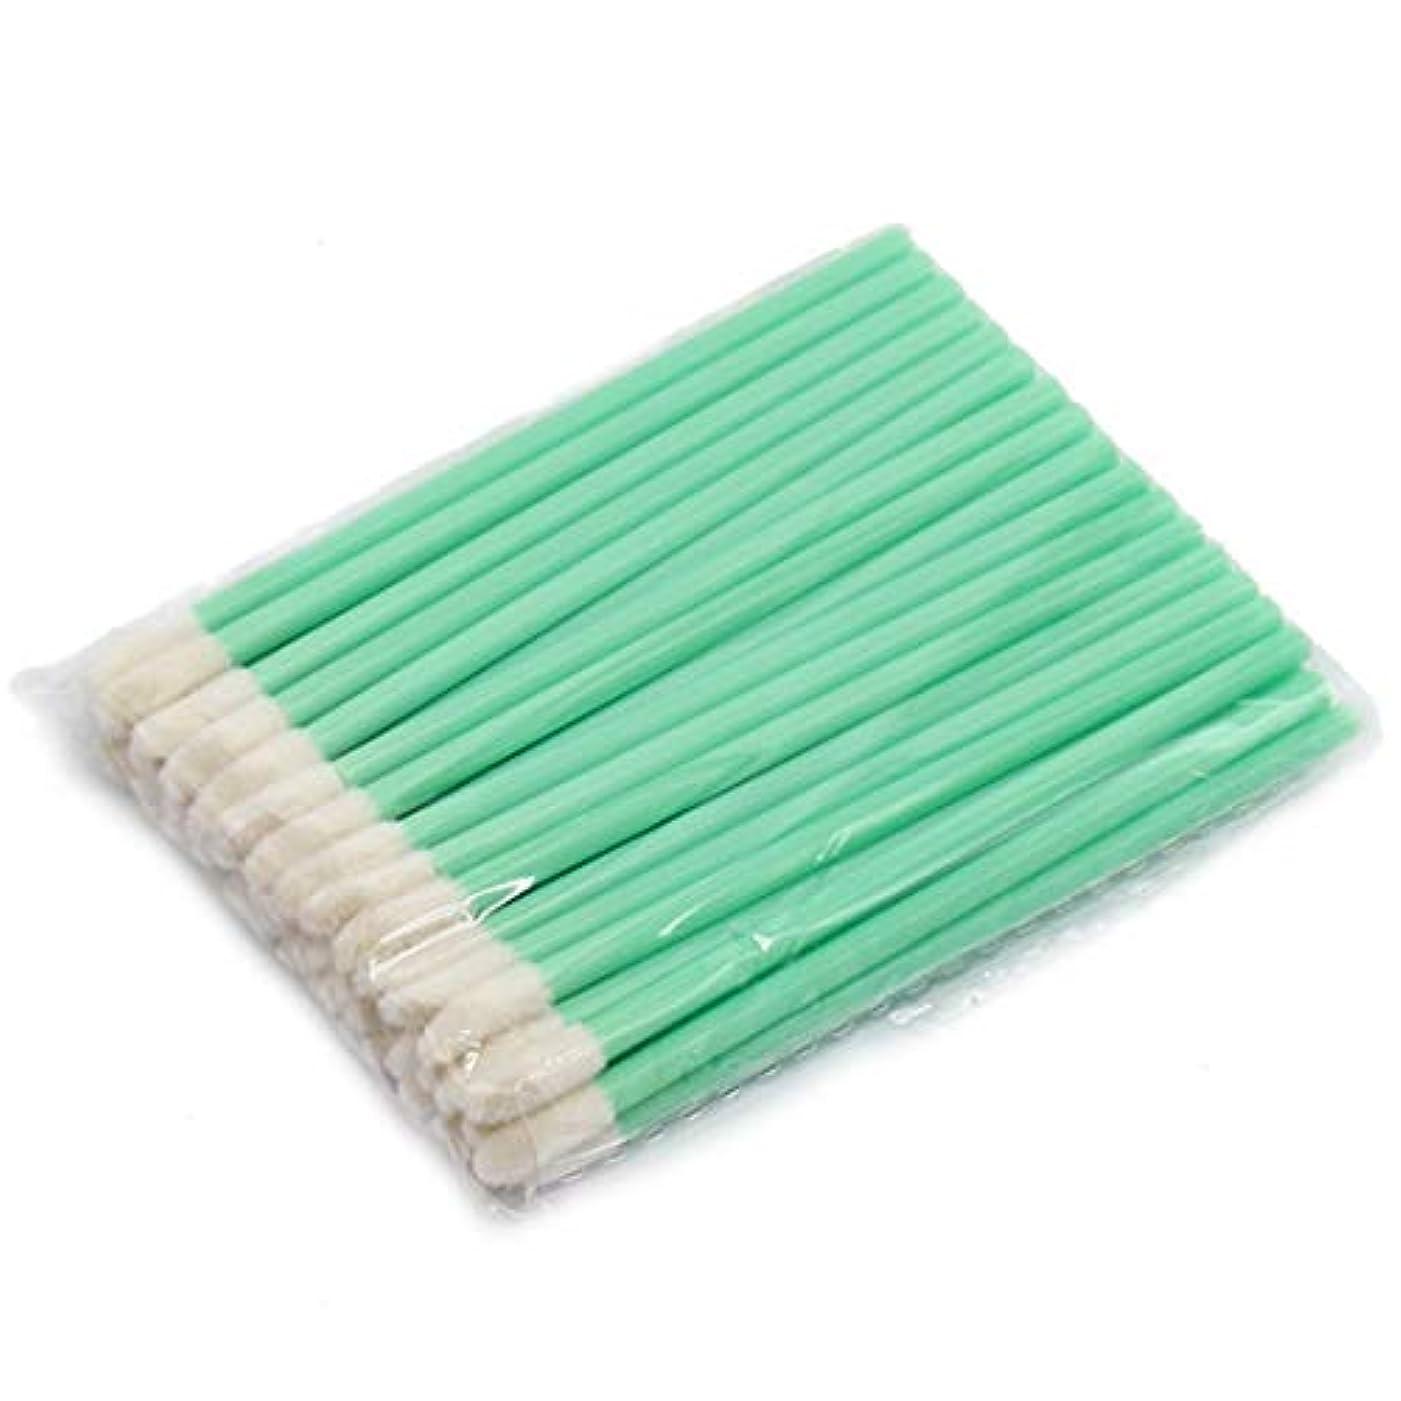 Makeup brushes メイクアップ使い捨てリップブラシ口紅グロススティックアプリケーターメイクツールファッションデザイン-グリーン suits (Color : Green)